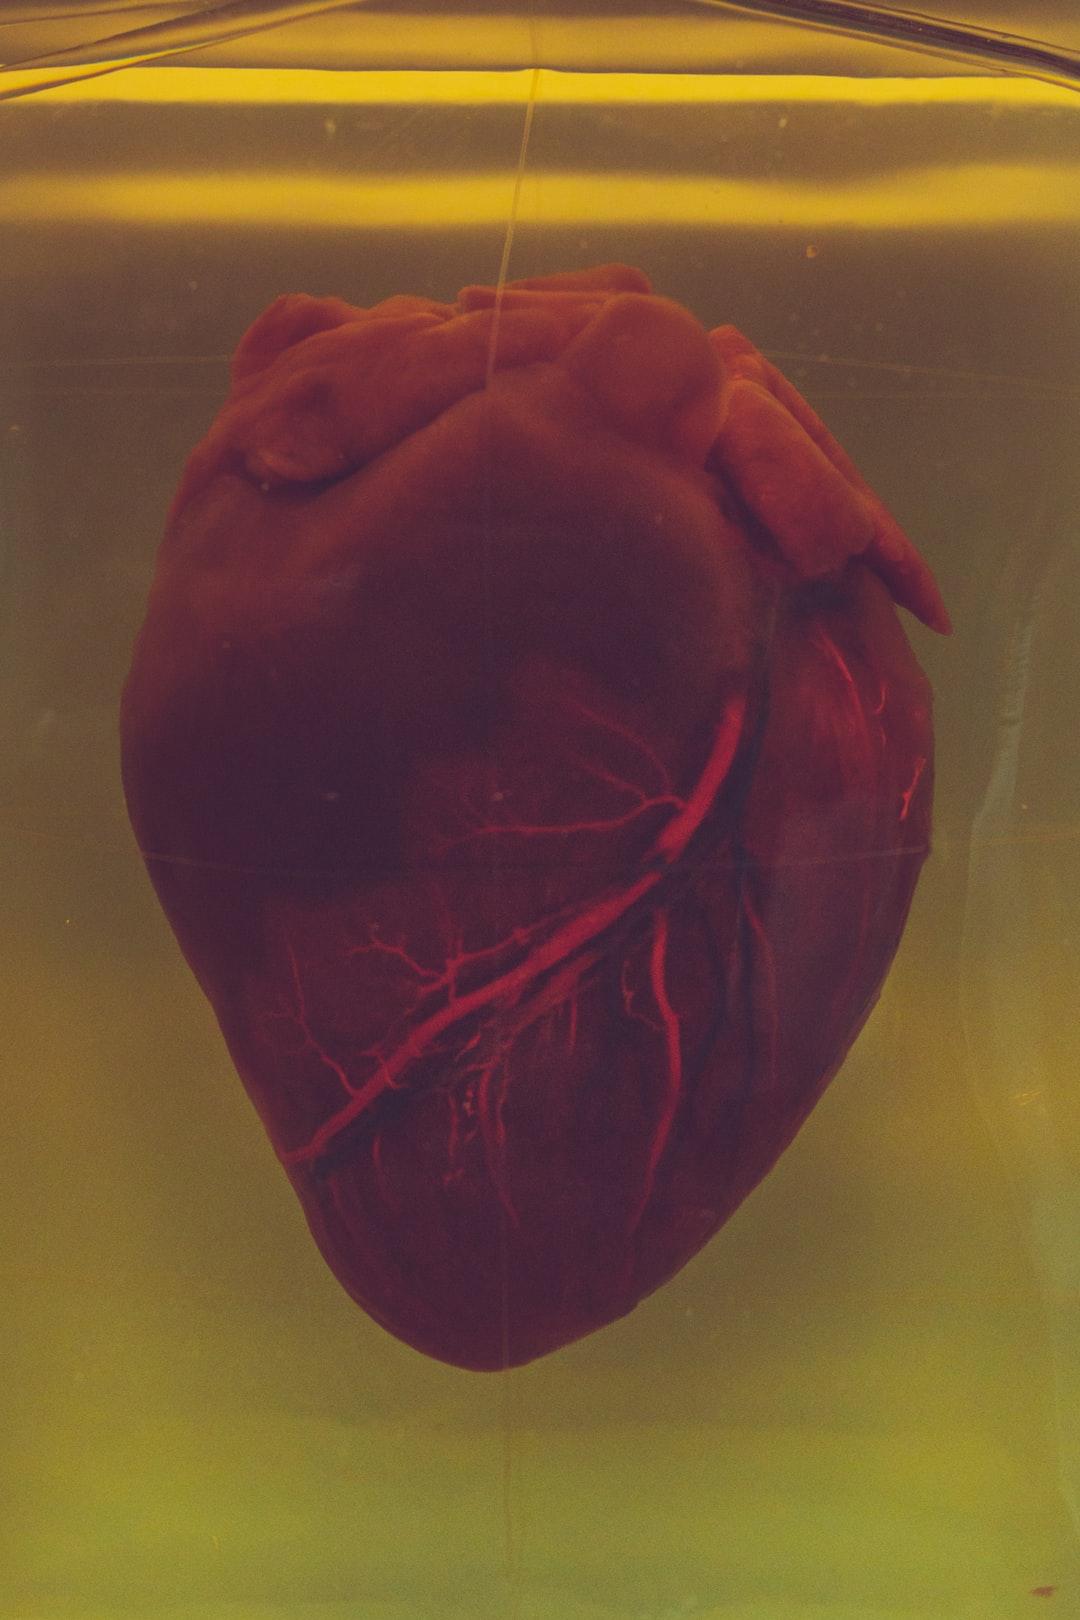 A real human heart inside a jar